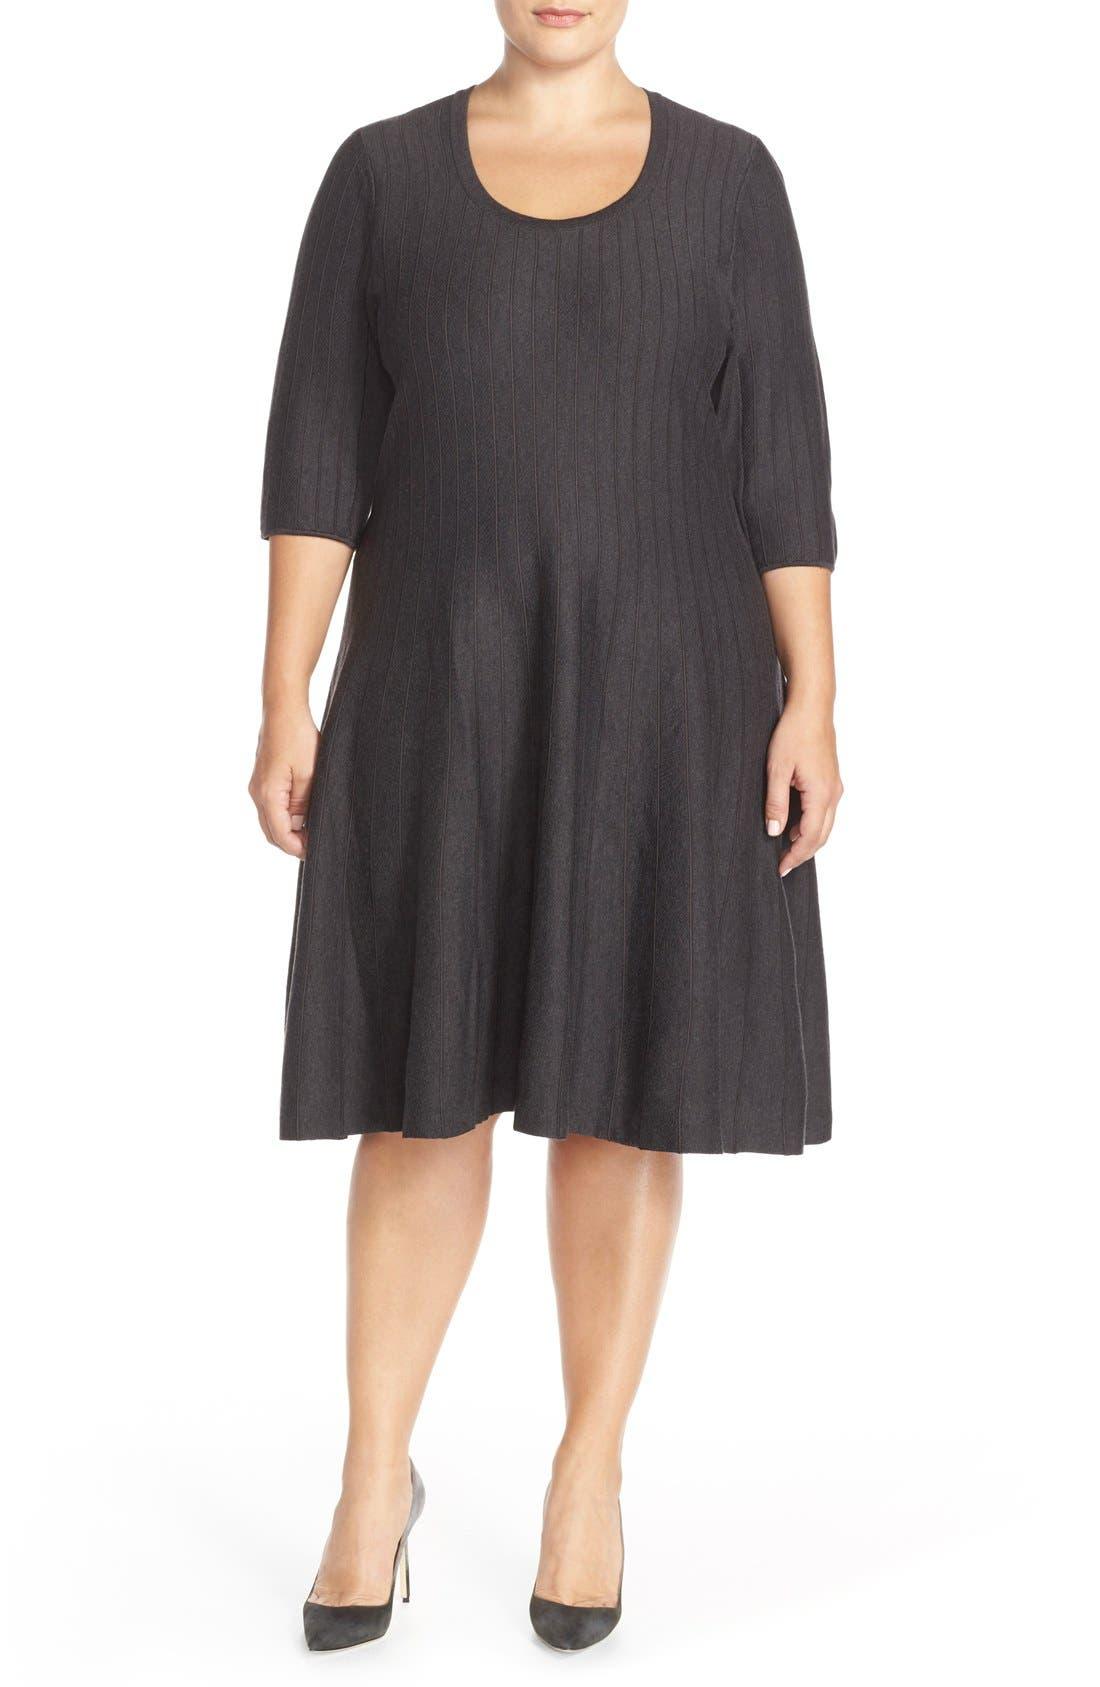 'Twirl' Elbow Sleeve Knit Fit & Flare Dress,                             Main thumbnail 1, color,                             Phantom Heather